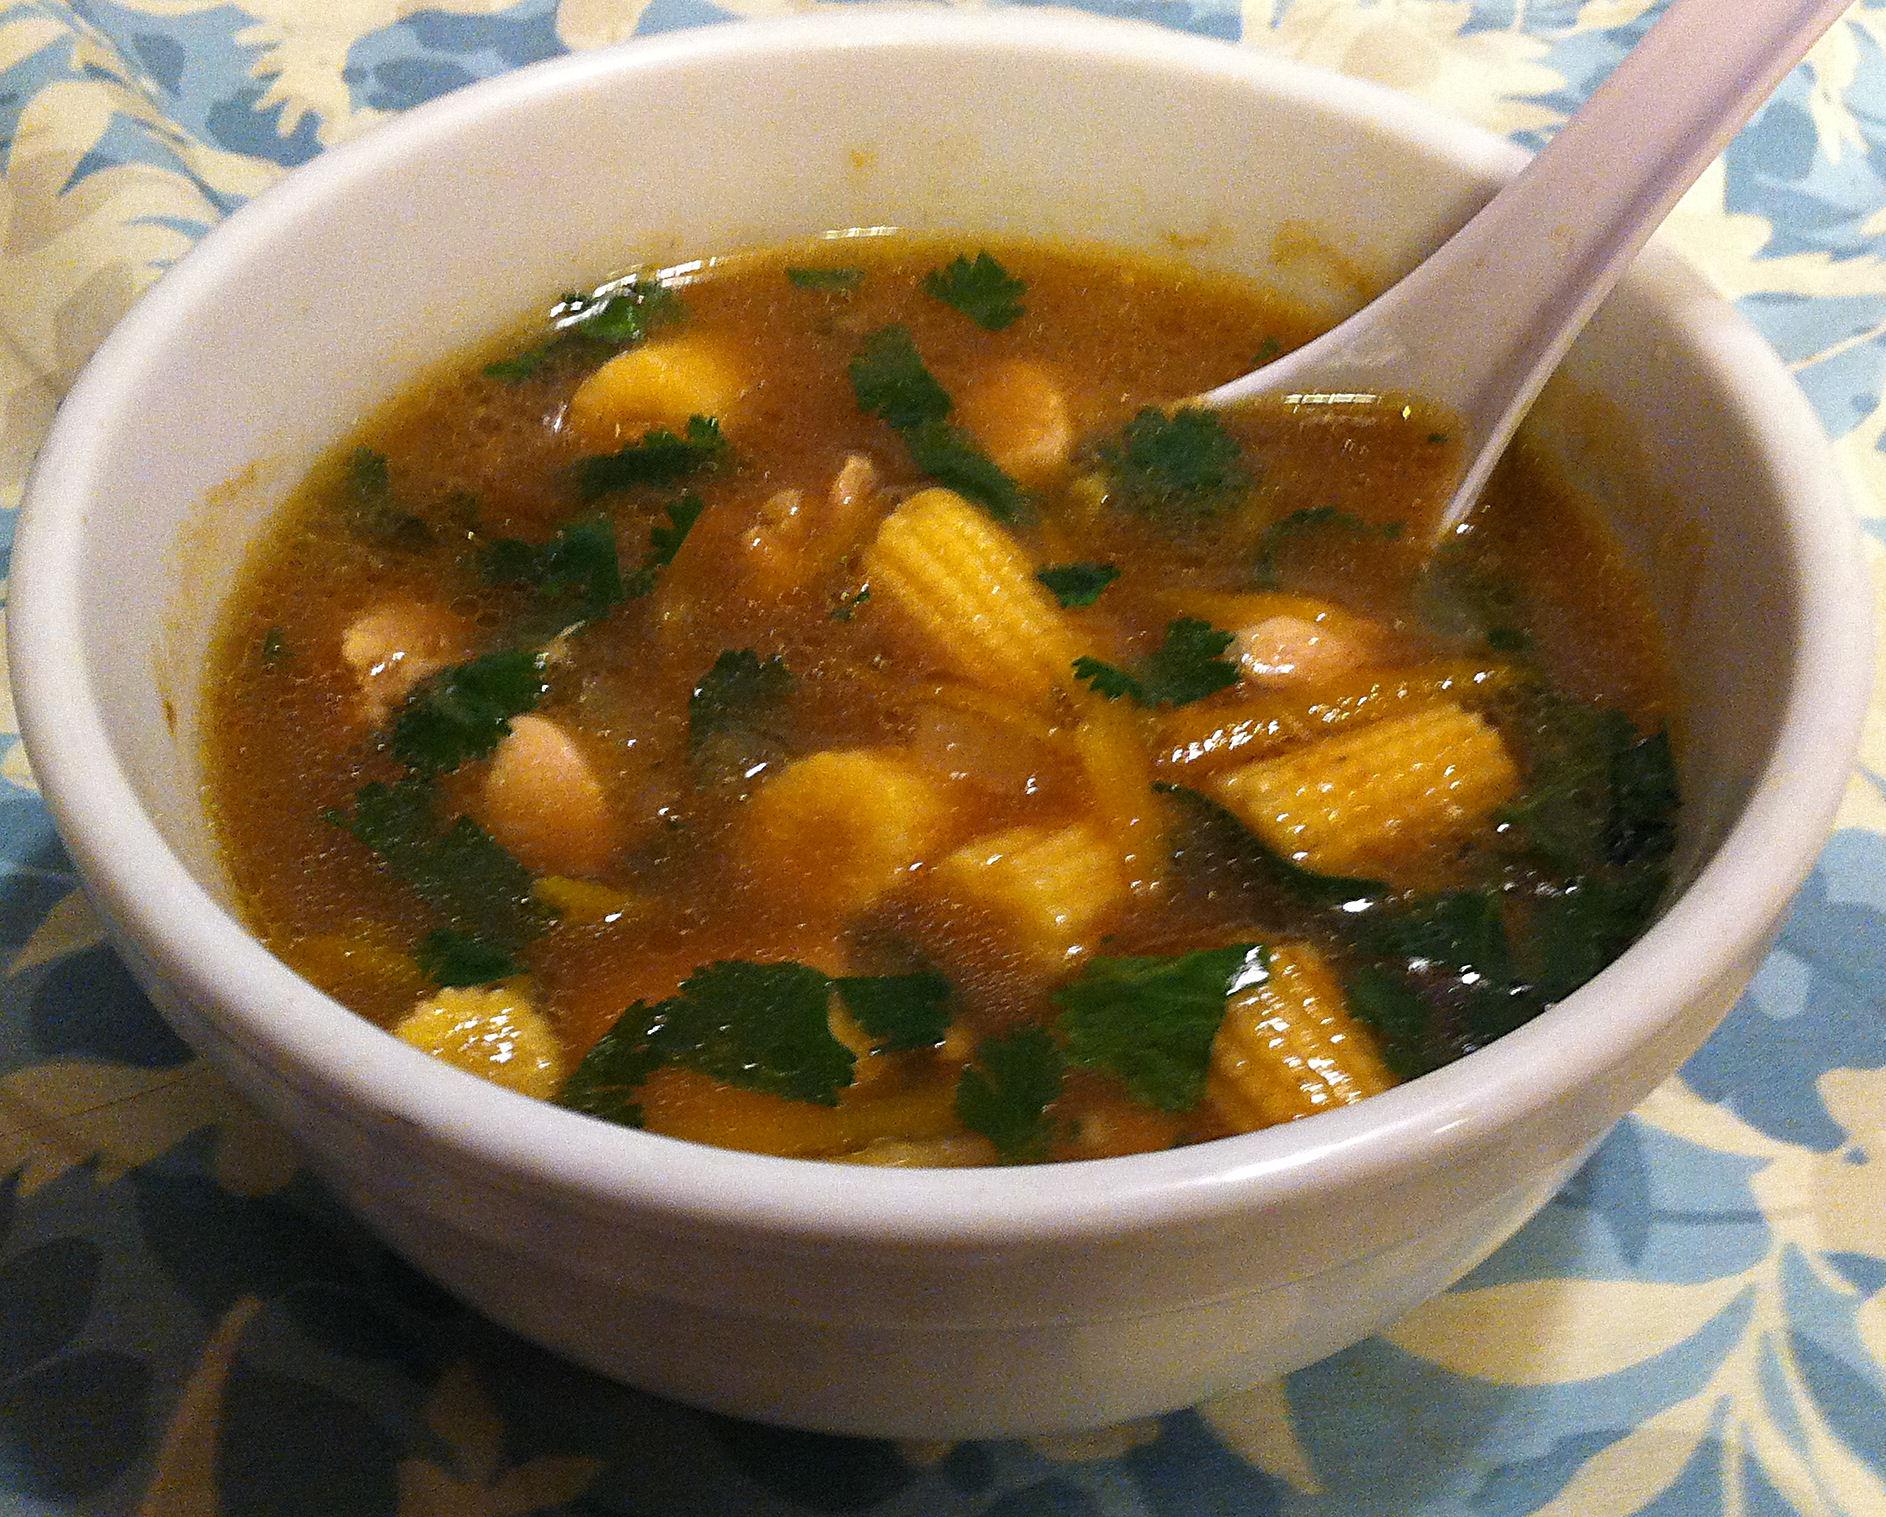 Karl S Lemongrass Chicken Soup Jabberwocky Stew